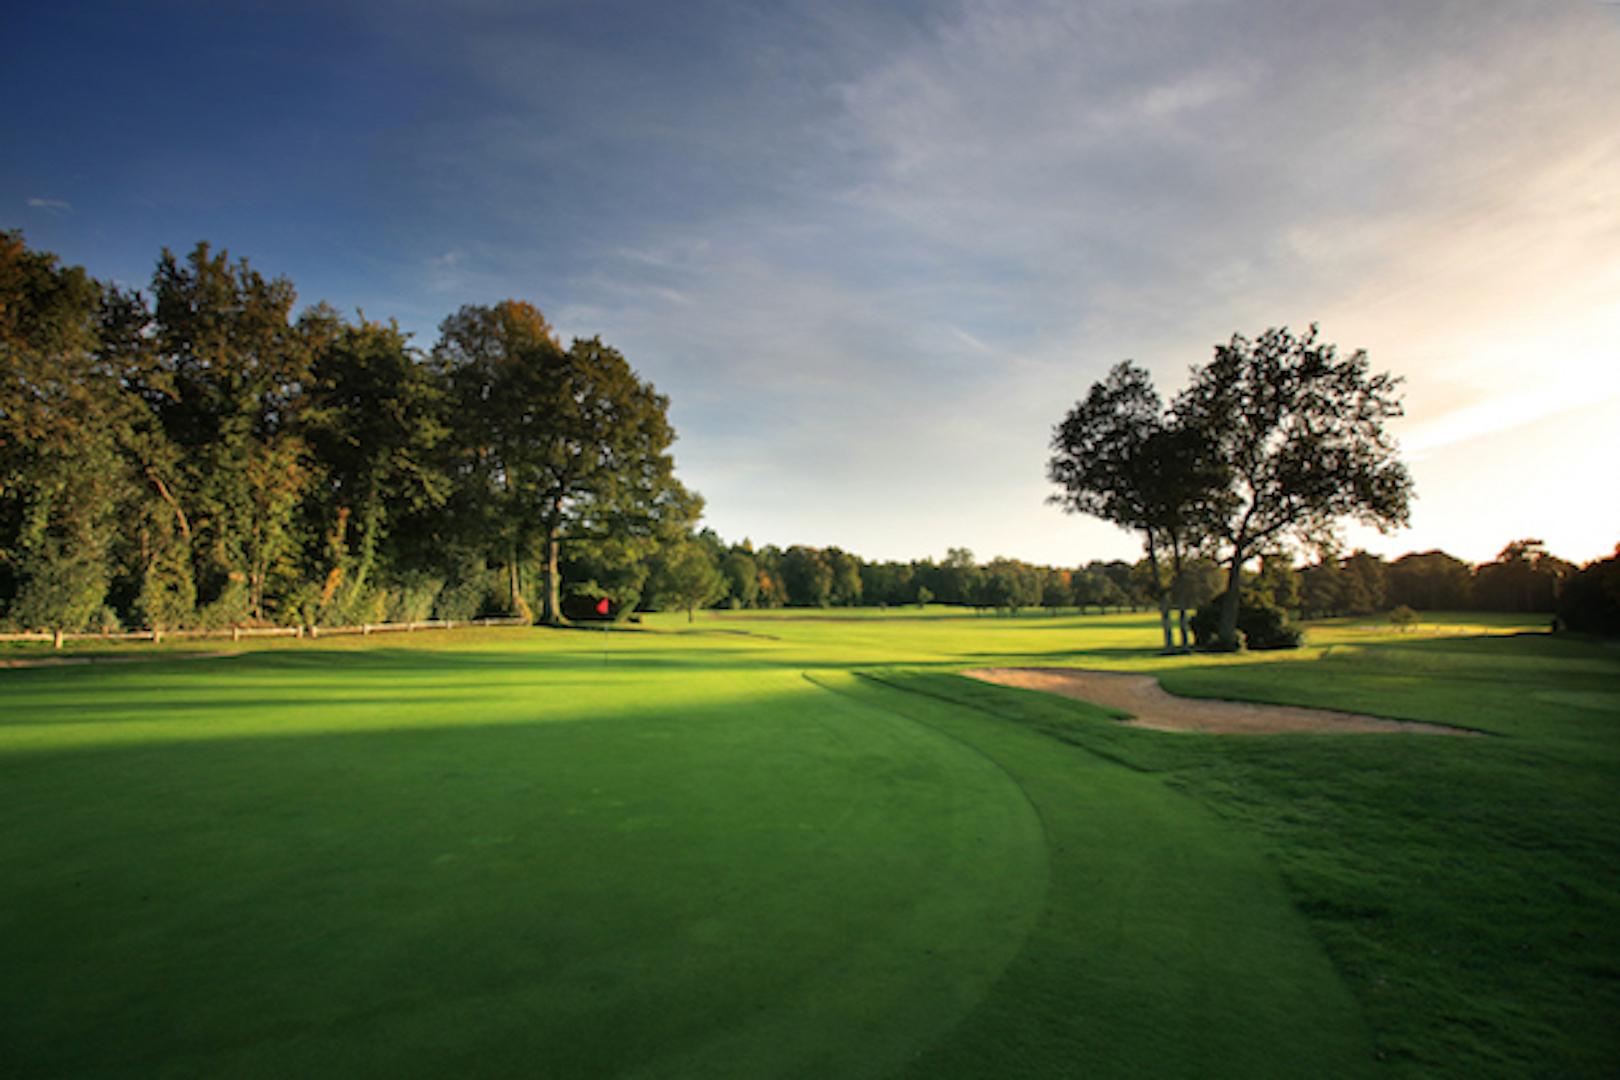 GolfPunk plays Copthorne Golf Club